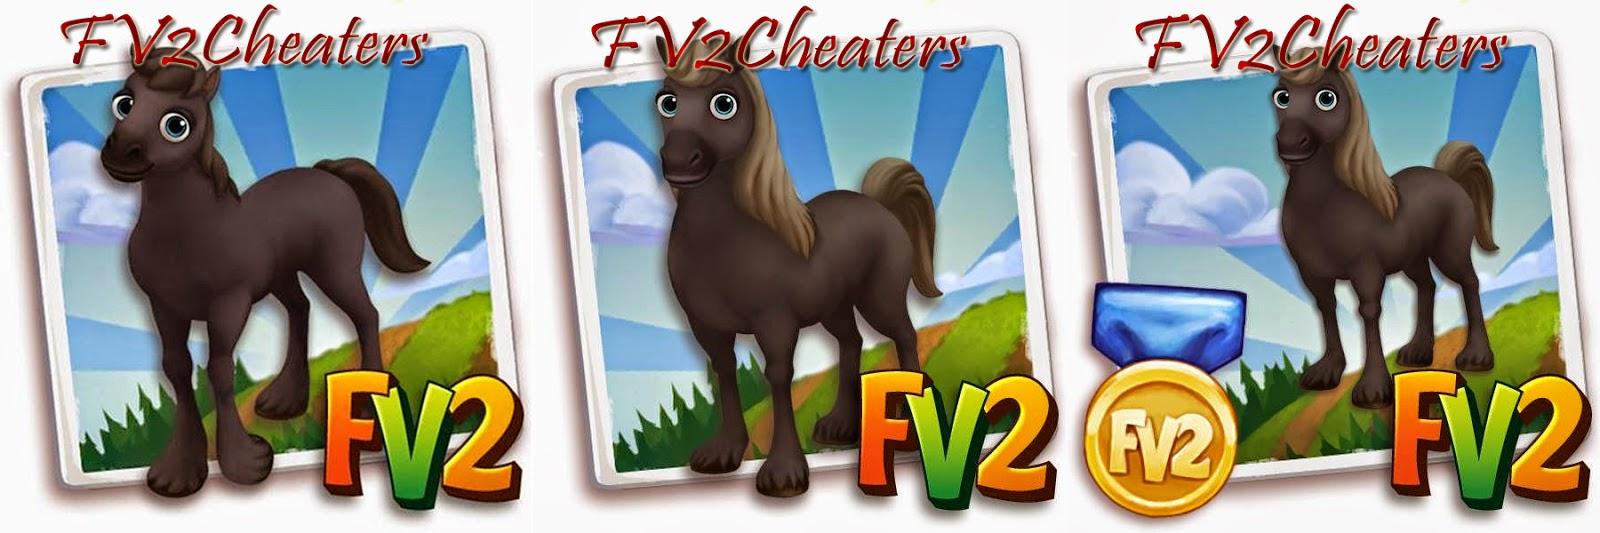 Farmville 2 cheaters farmville 2 cheat code for black for Farmville horse